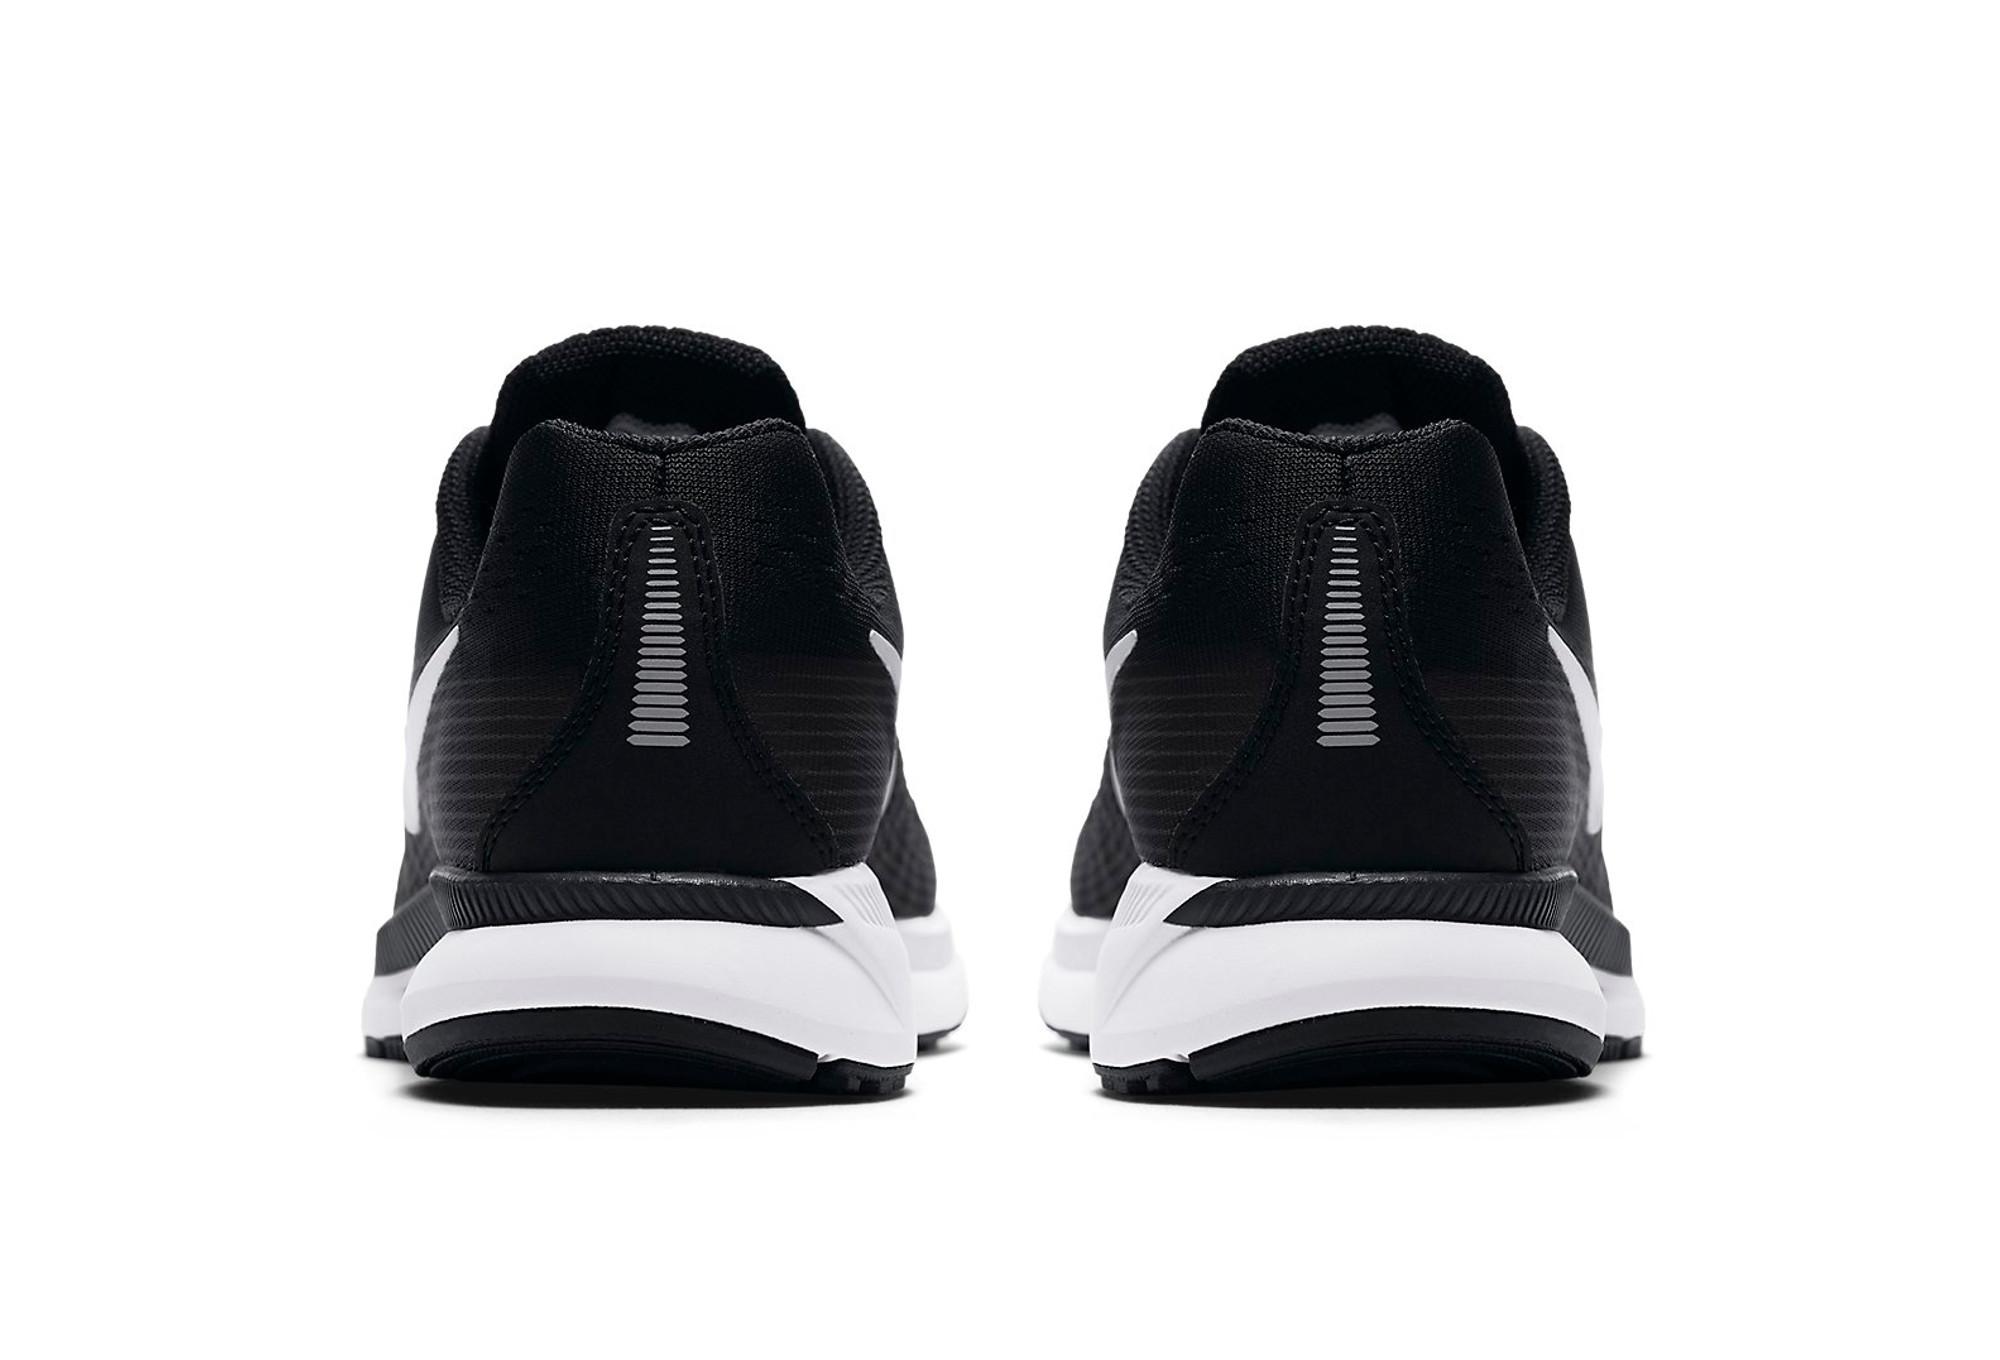 938c4e86a8352 Chaussures Enfant Nike Air Zoom Pegasus 34 Noir   Blanc